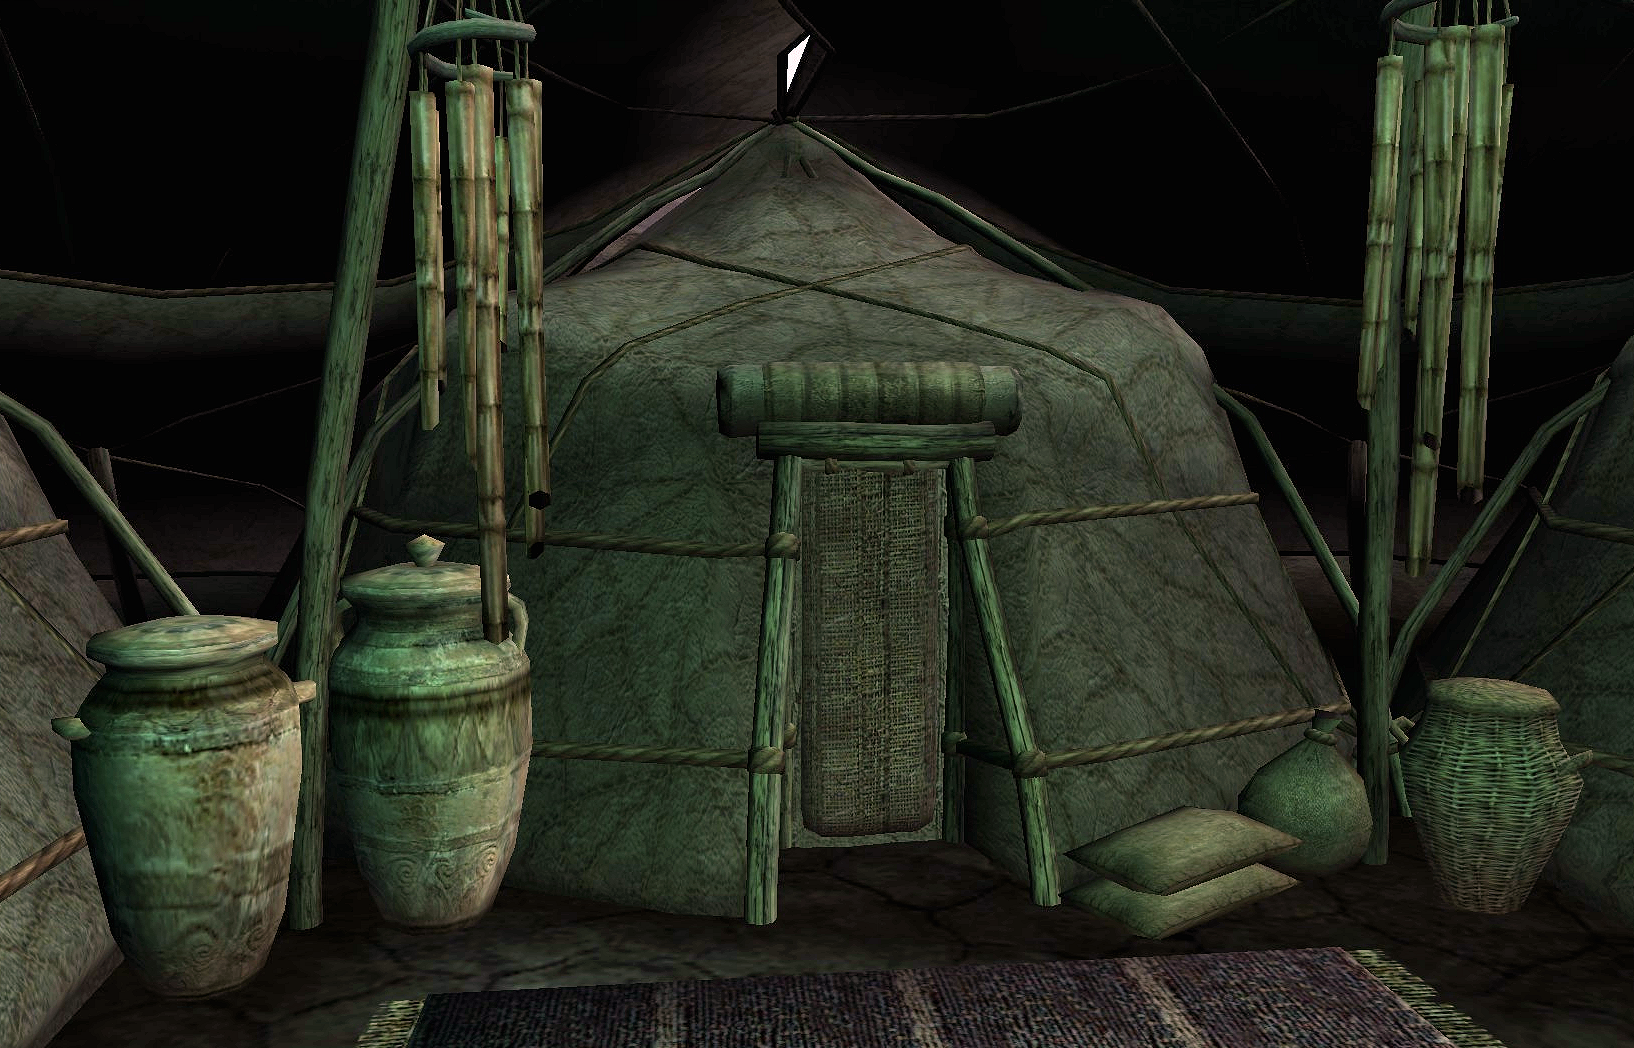 Ashkhan's Yurt (Urshilaku)